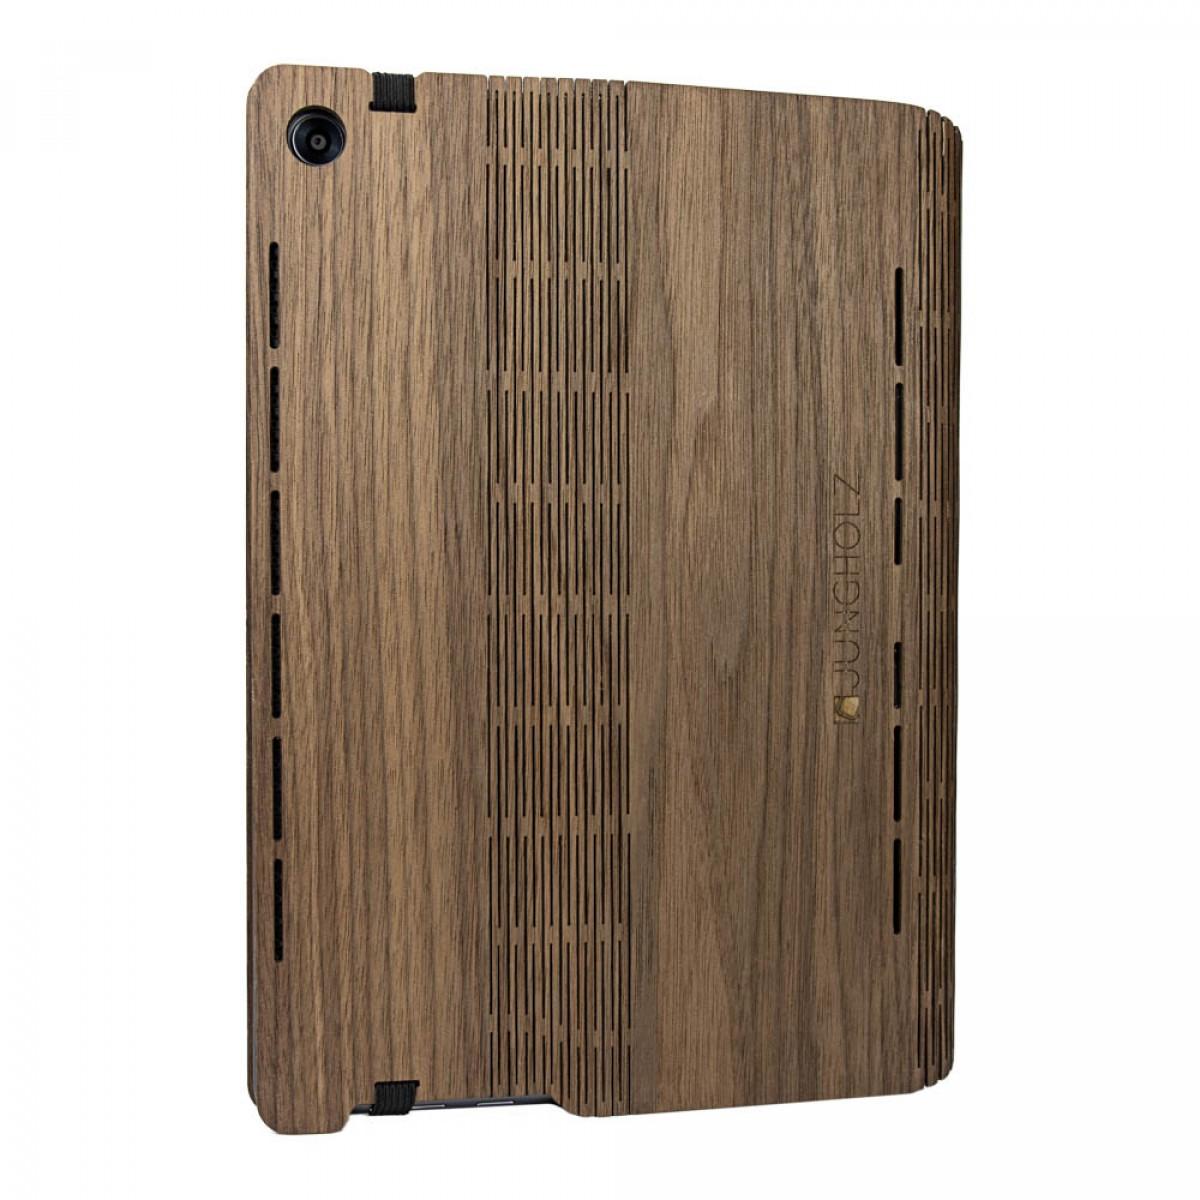 JUNGHOLZ Design WoodCase, Tablet, Walnuss, Huawei MediaPad M5 Pro 10.8''